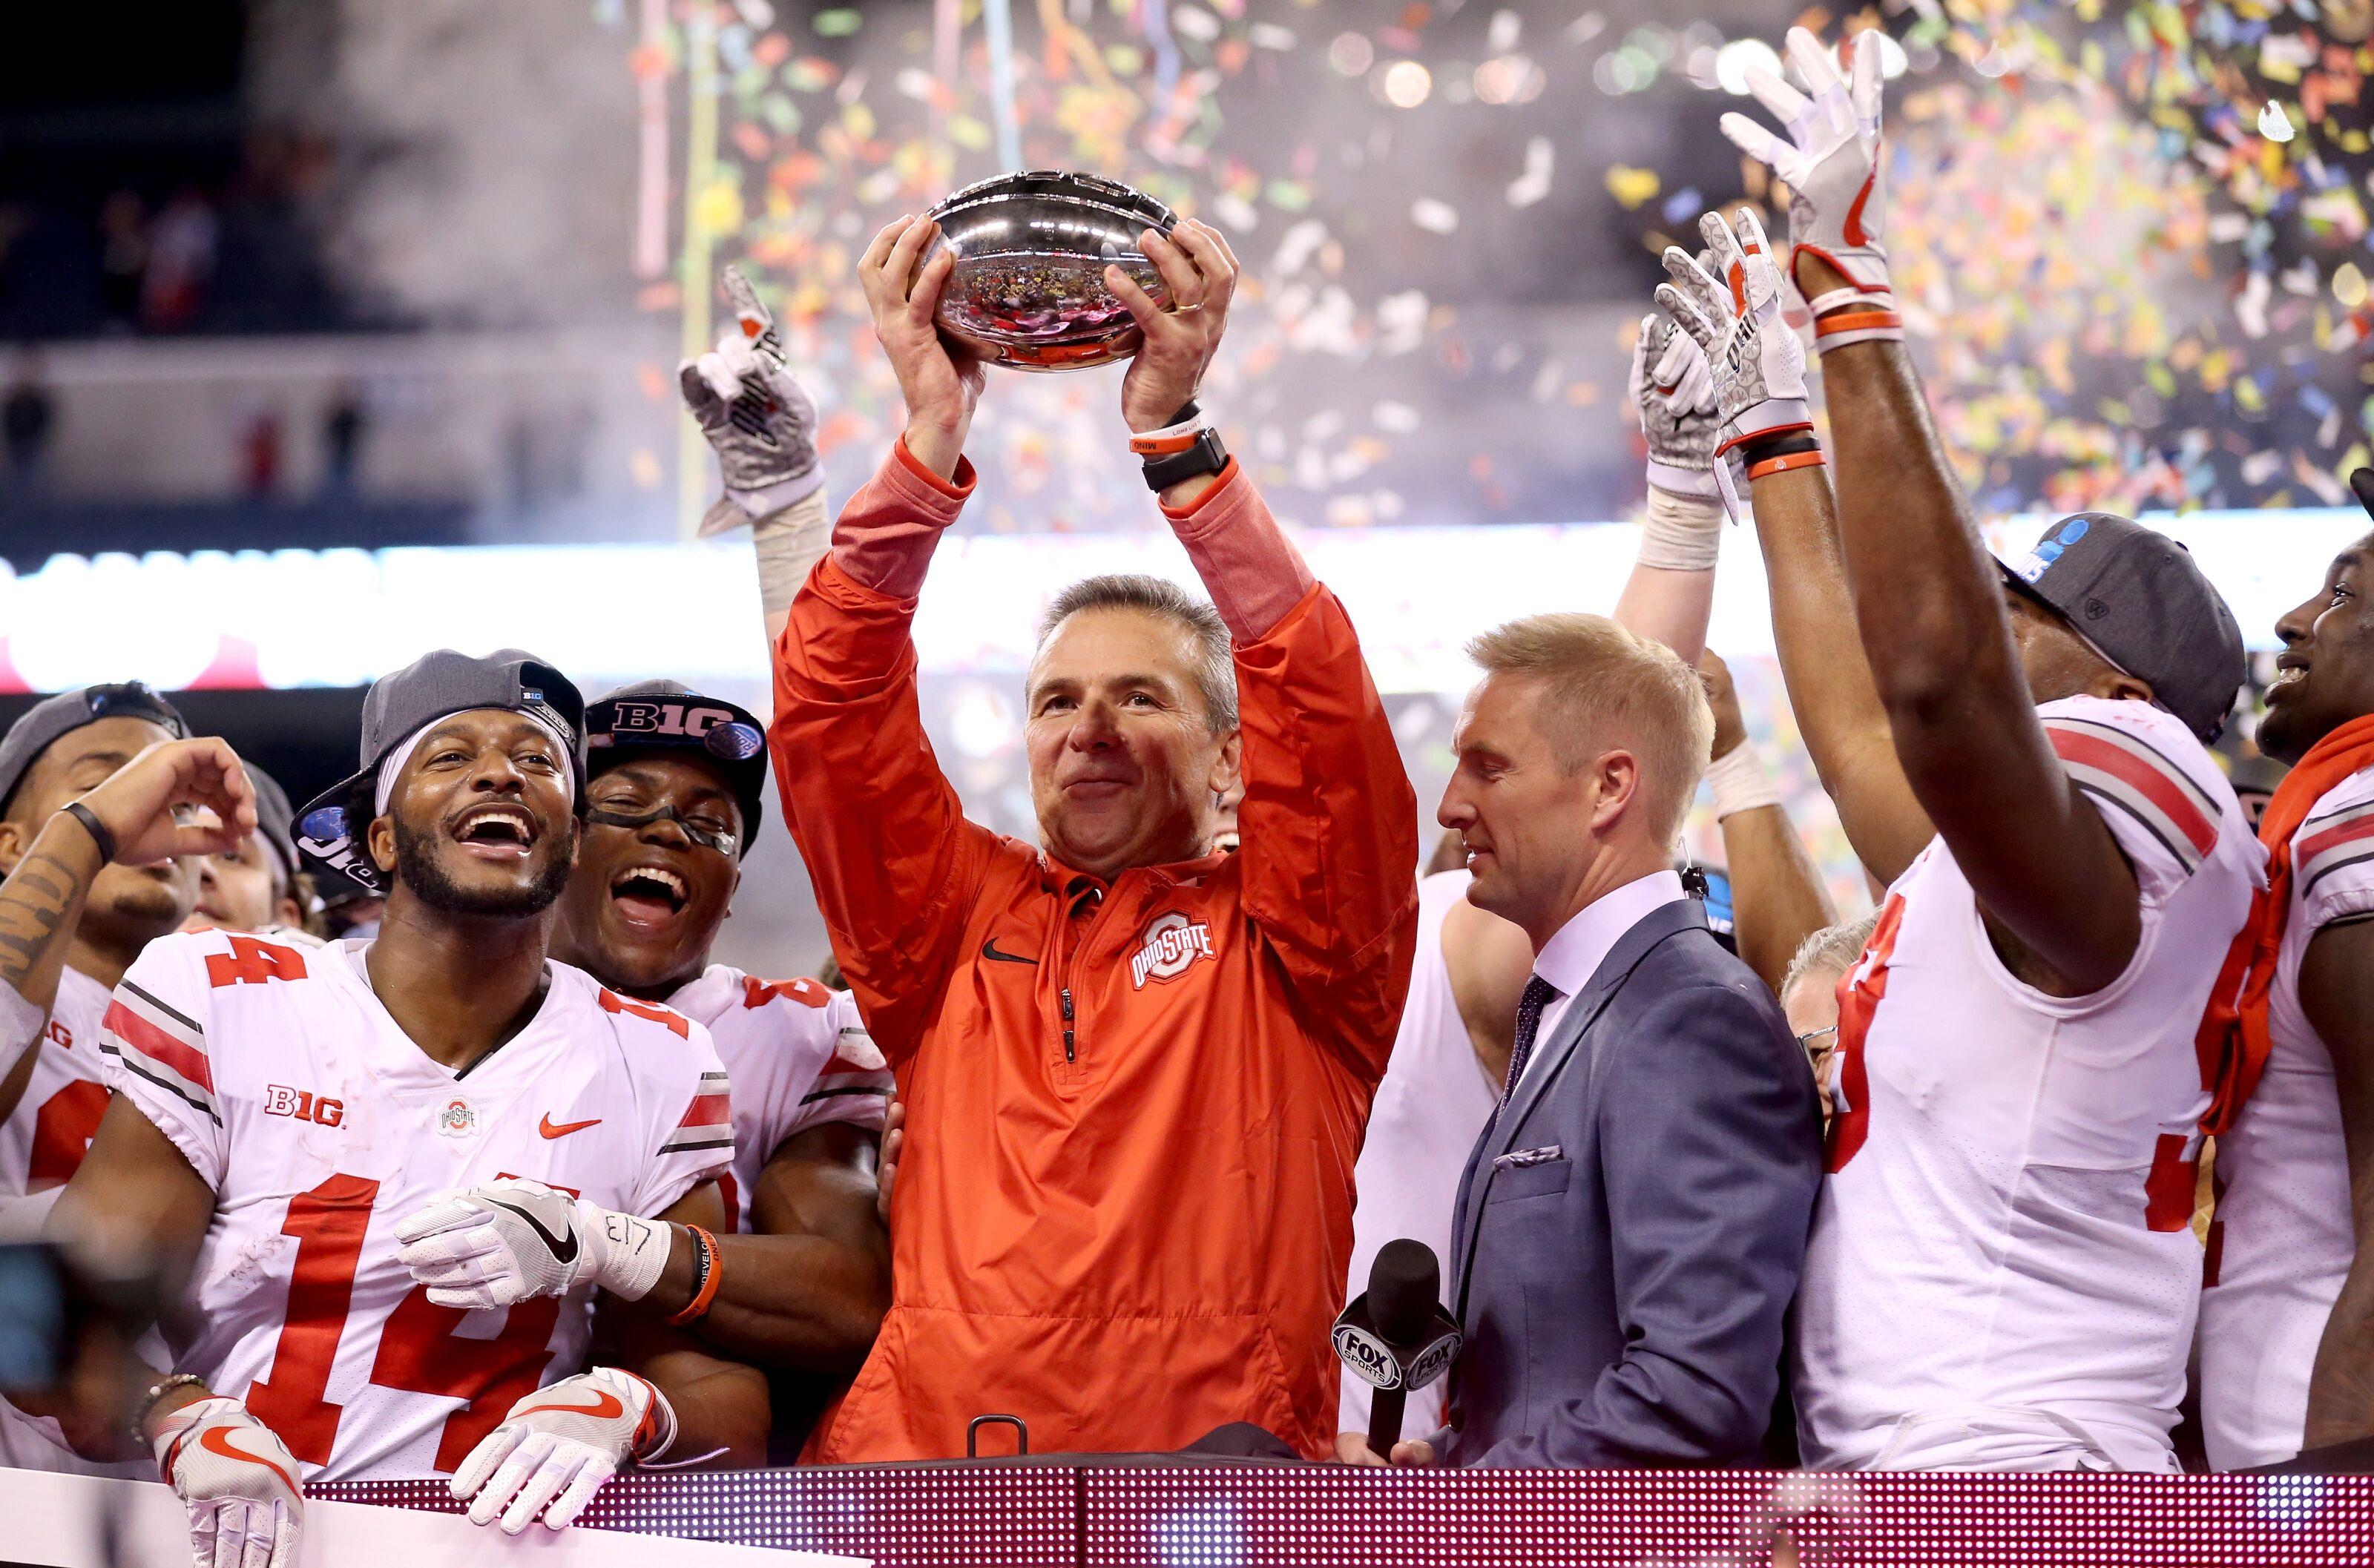 USC Football: Zach Smith believes Urban Meyer will be next head coach